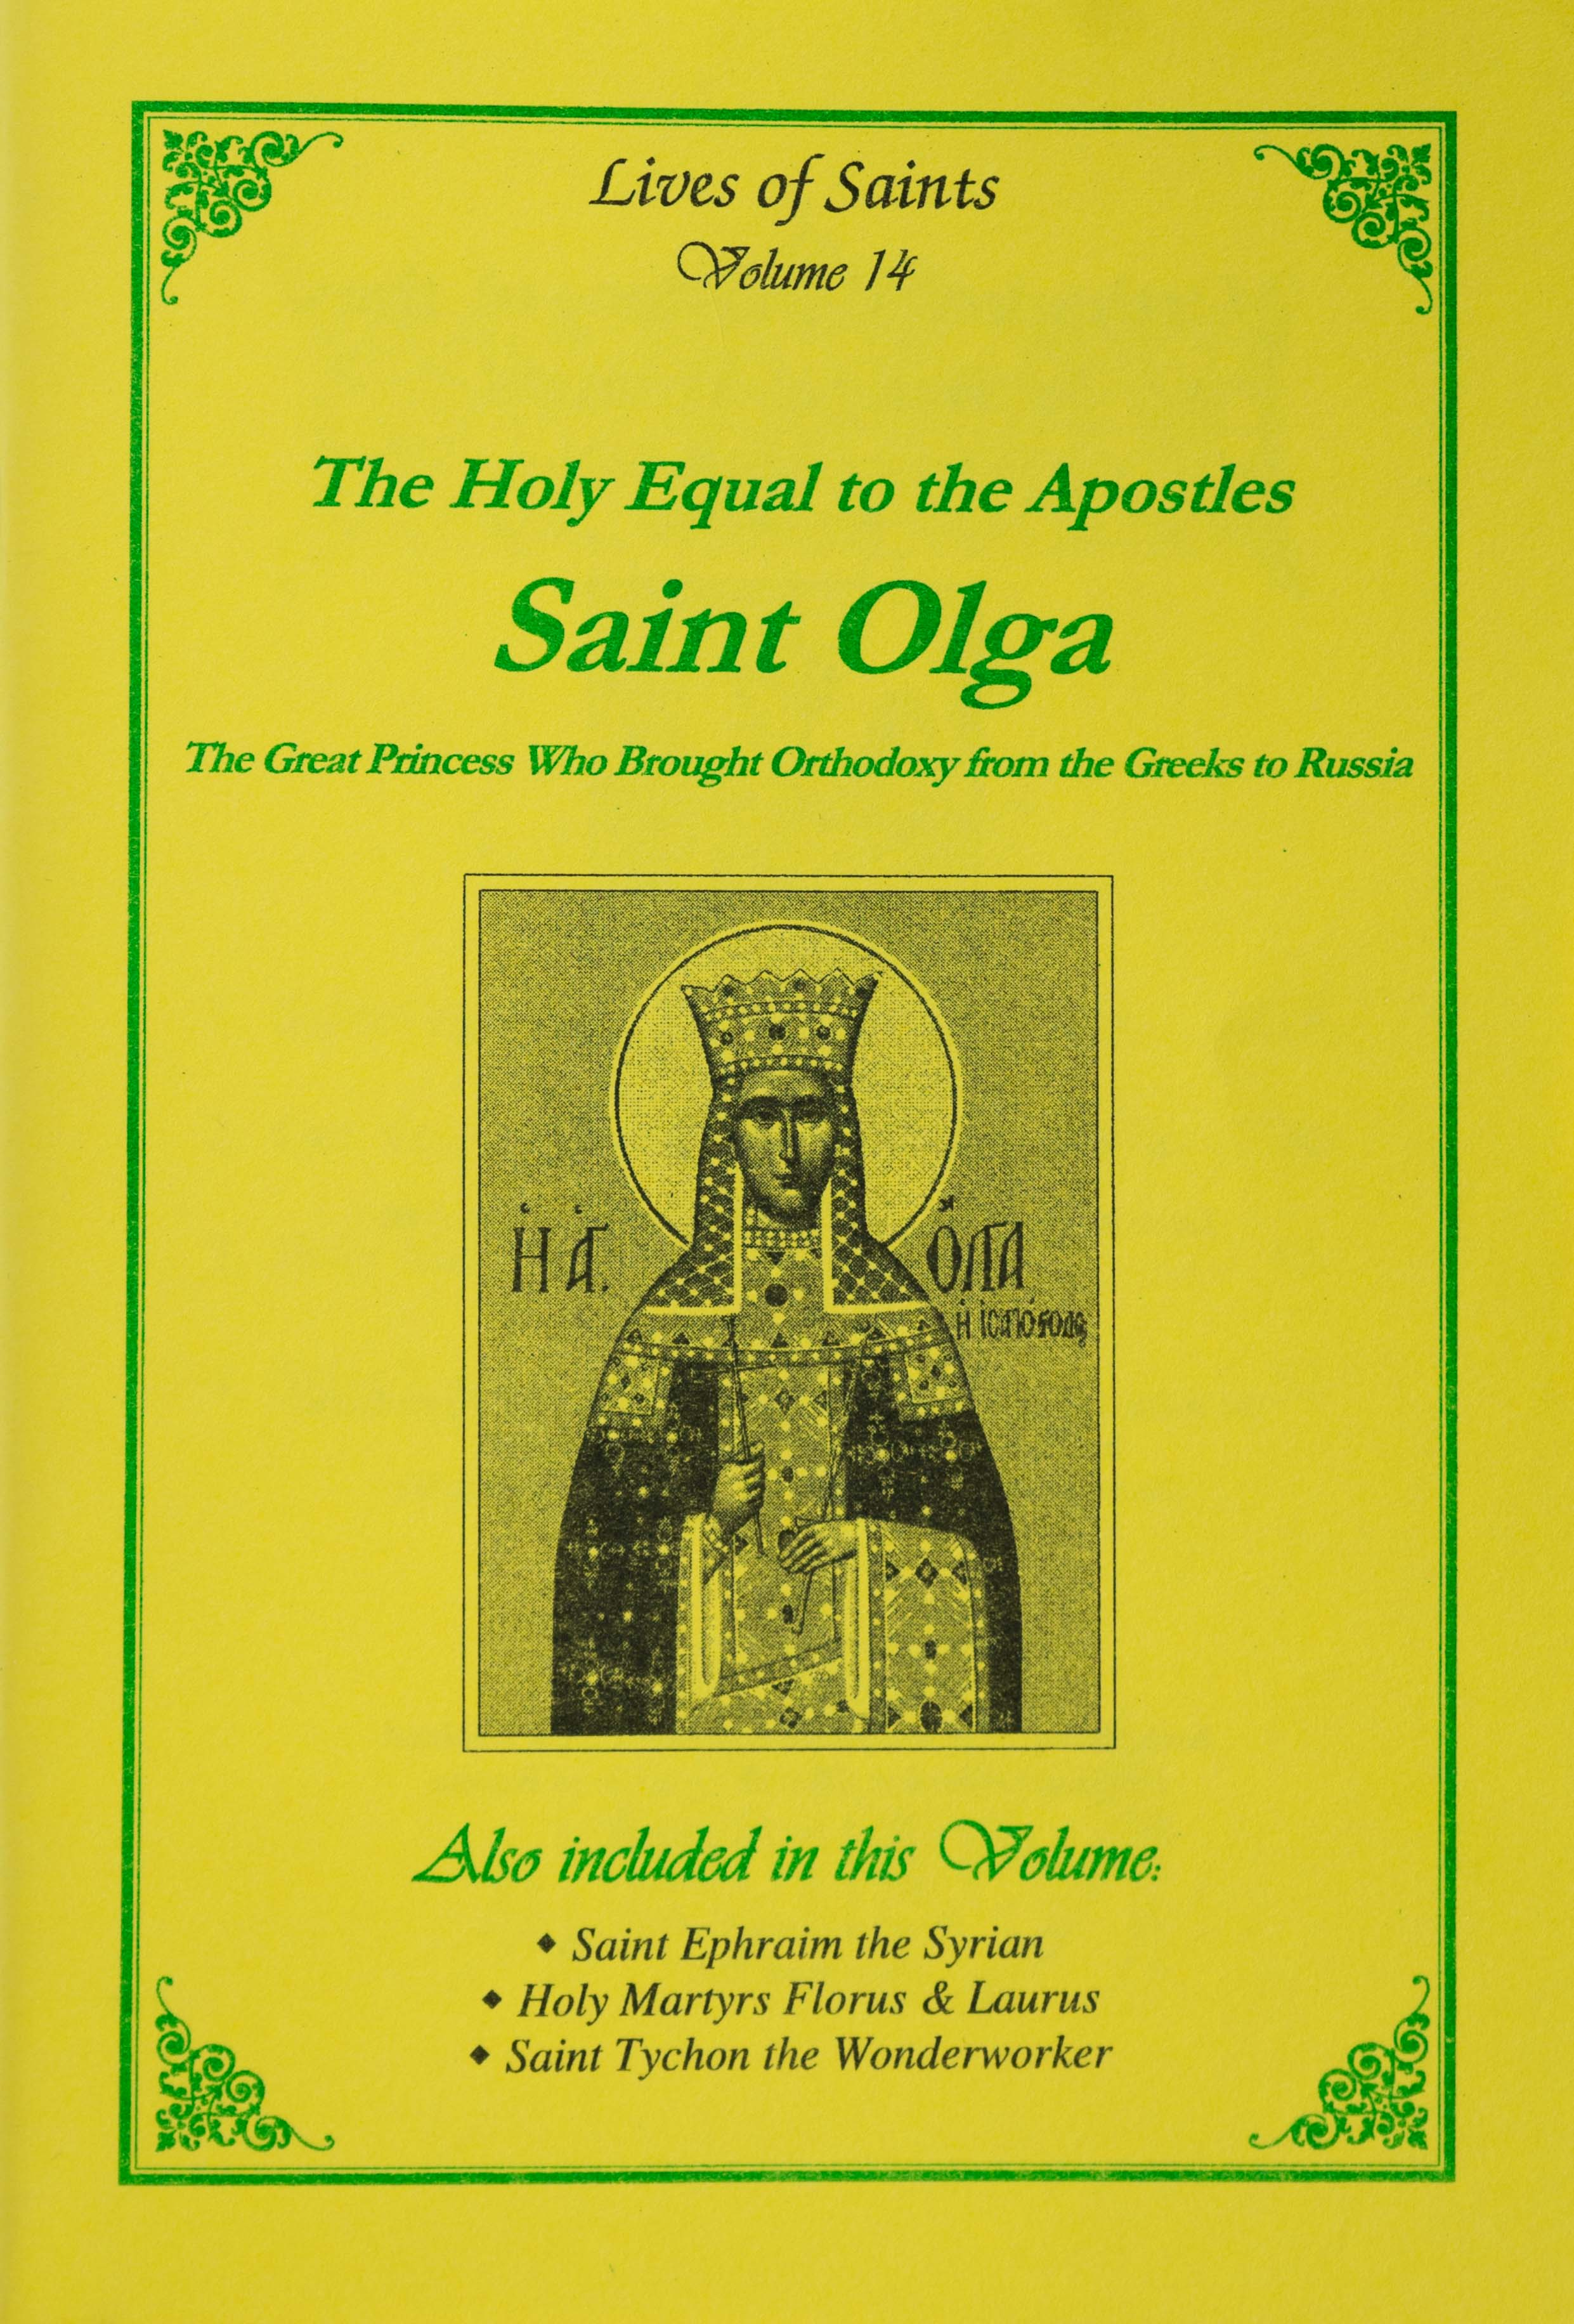 Lives of Saints Vol. 14: The Holy Equal to the Apostles Saint Olga